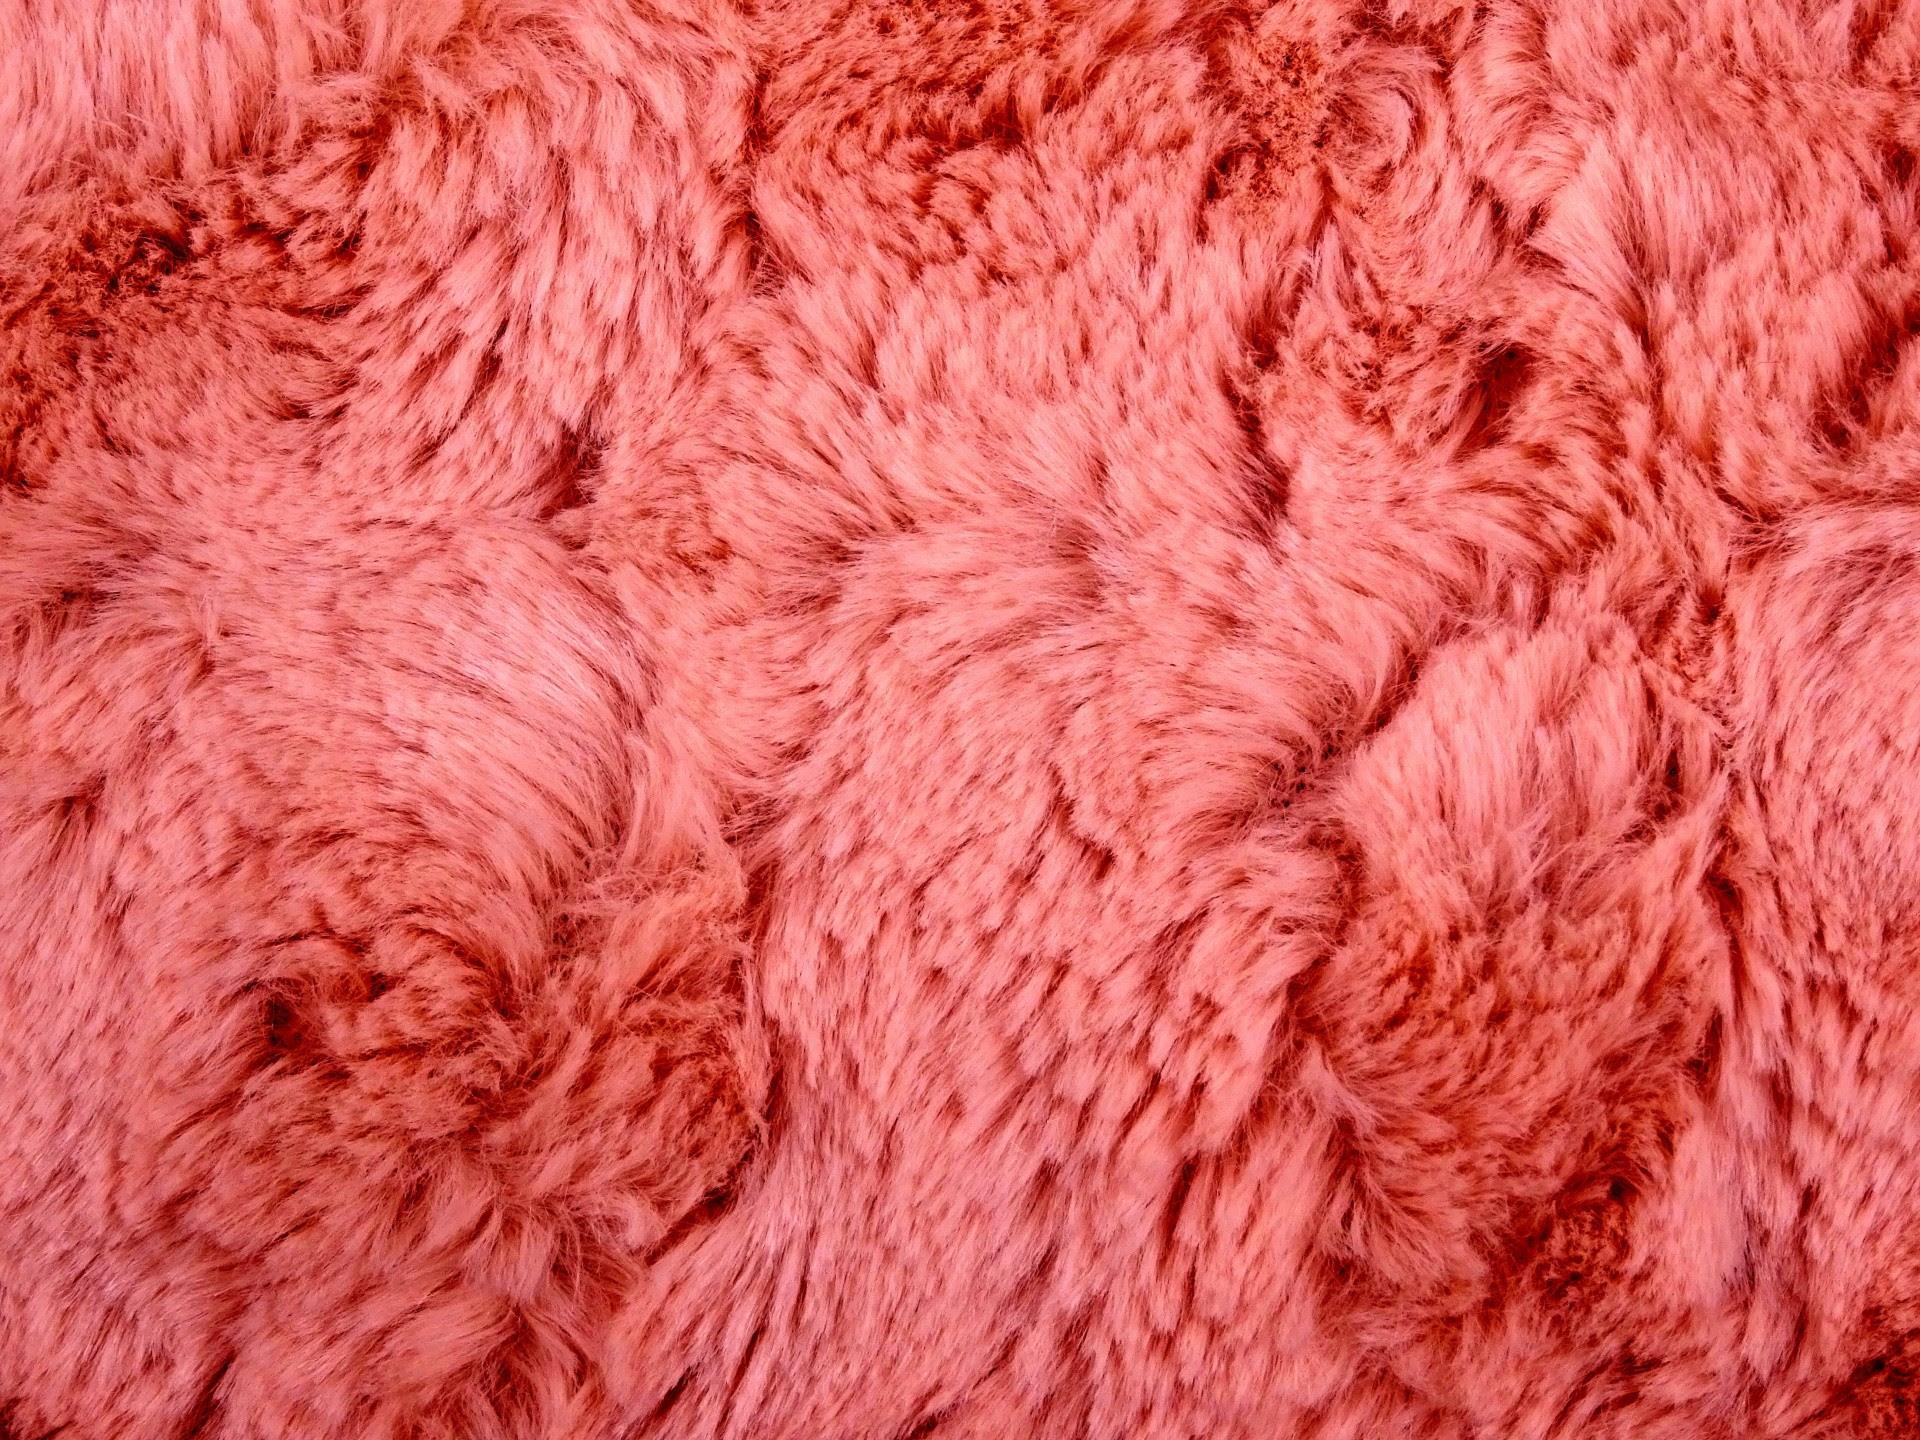 Fur Wallpaper 52 Images